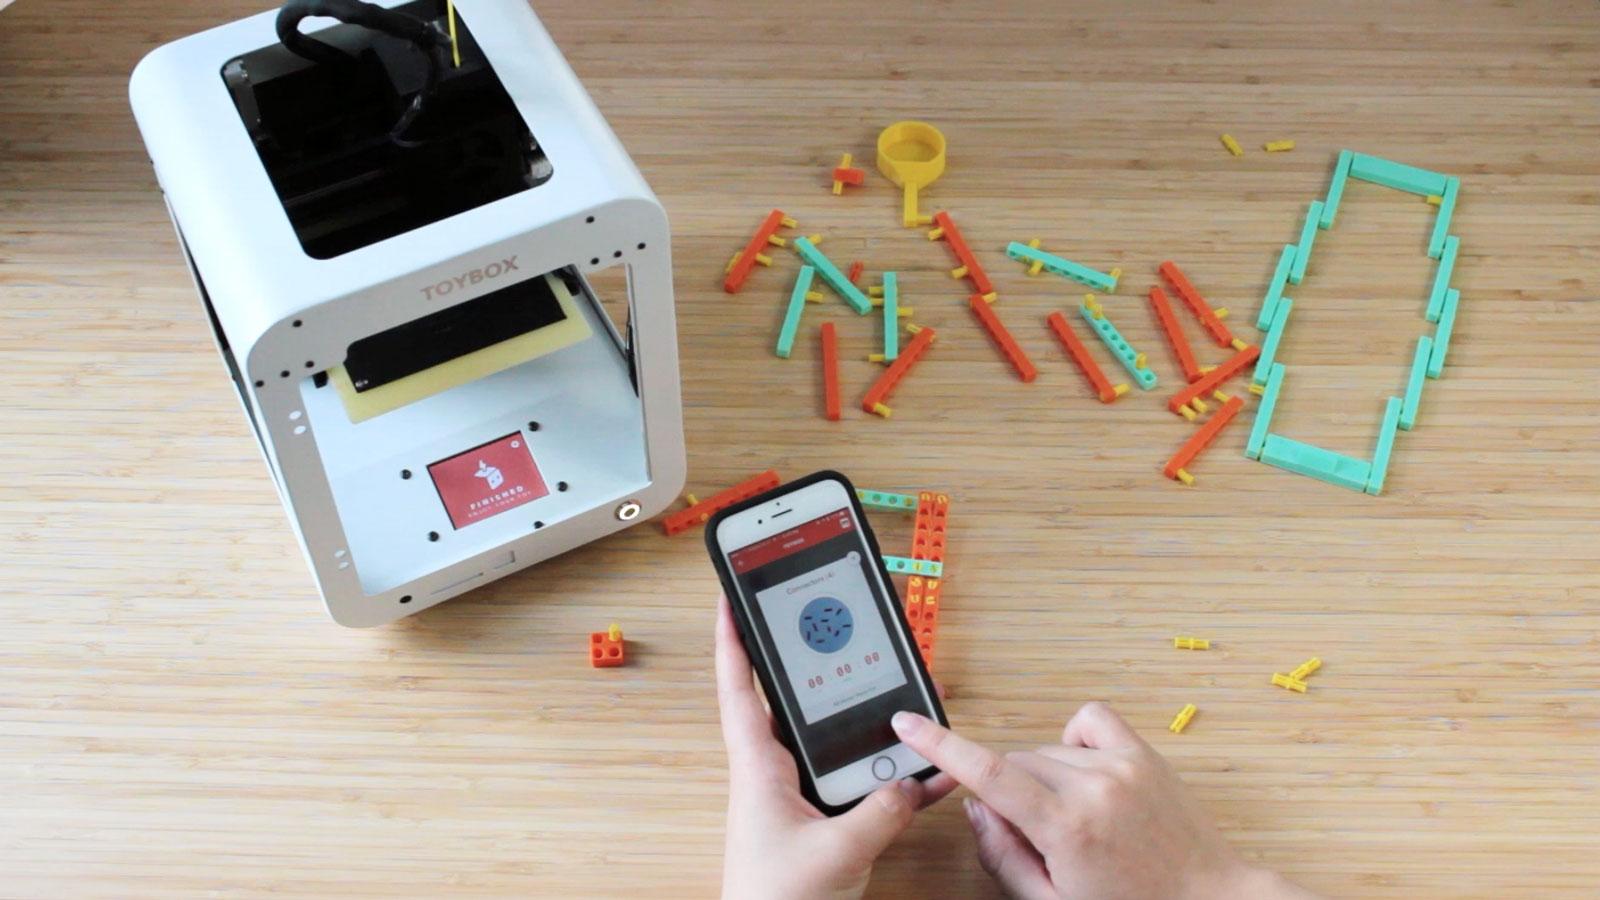 ToyBox, para imprimir otros juguetes